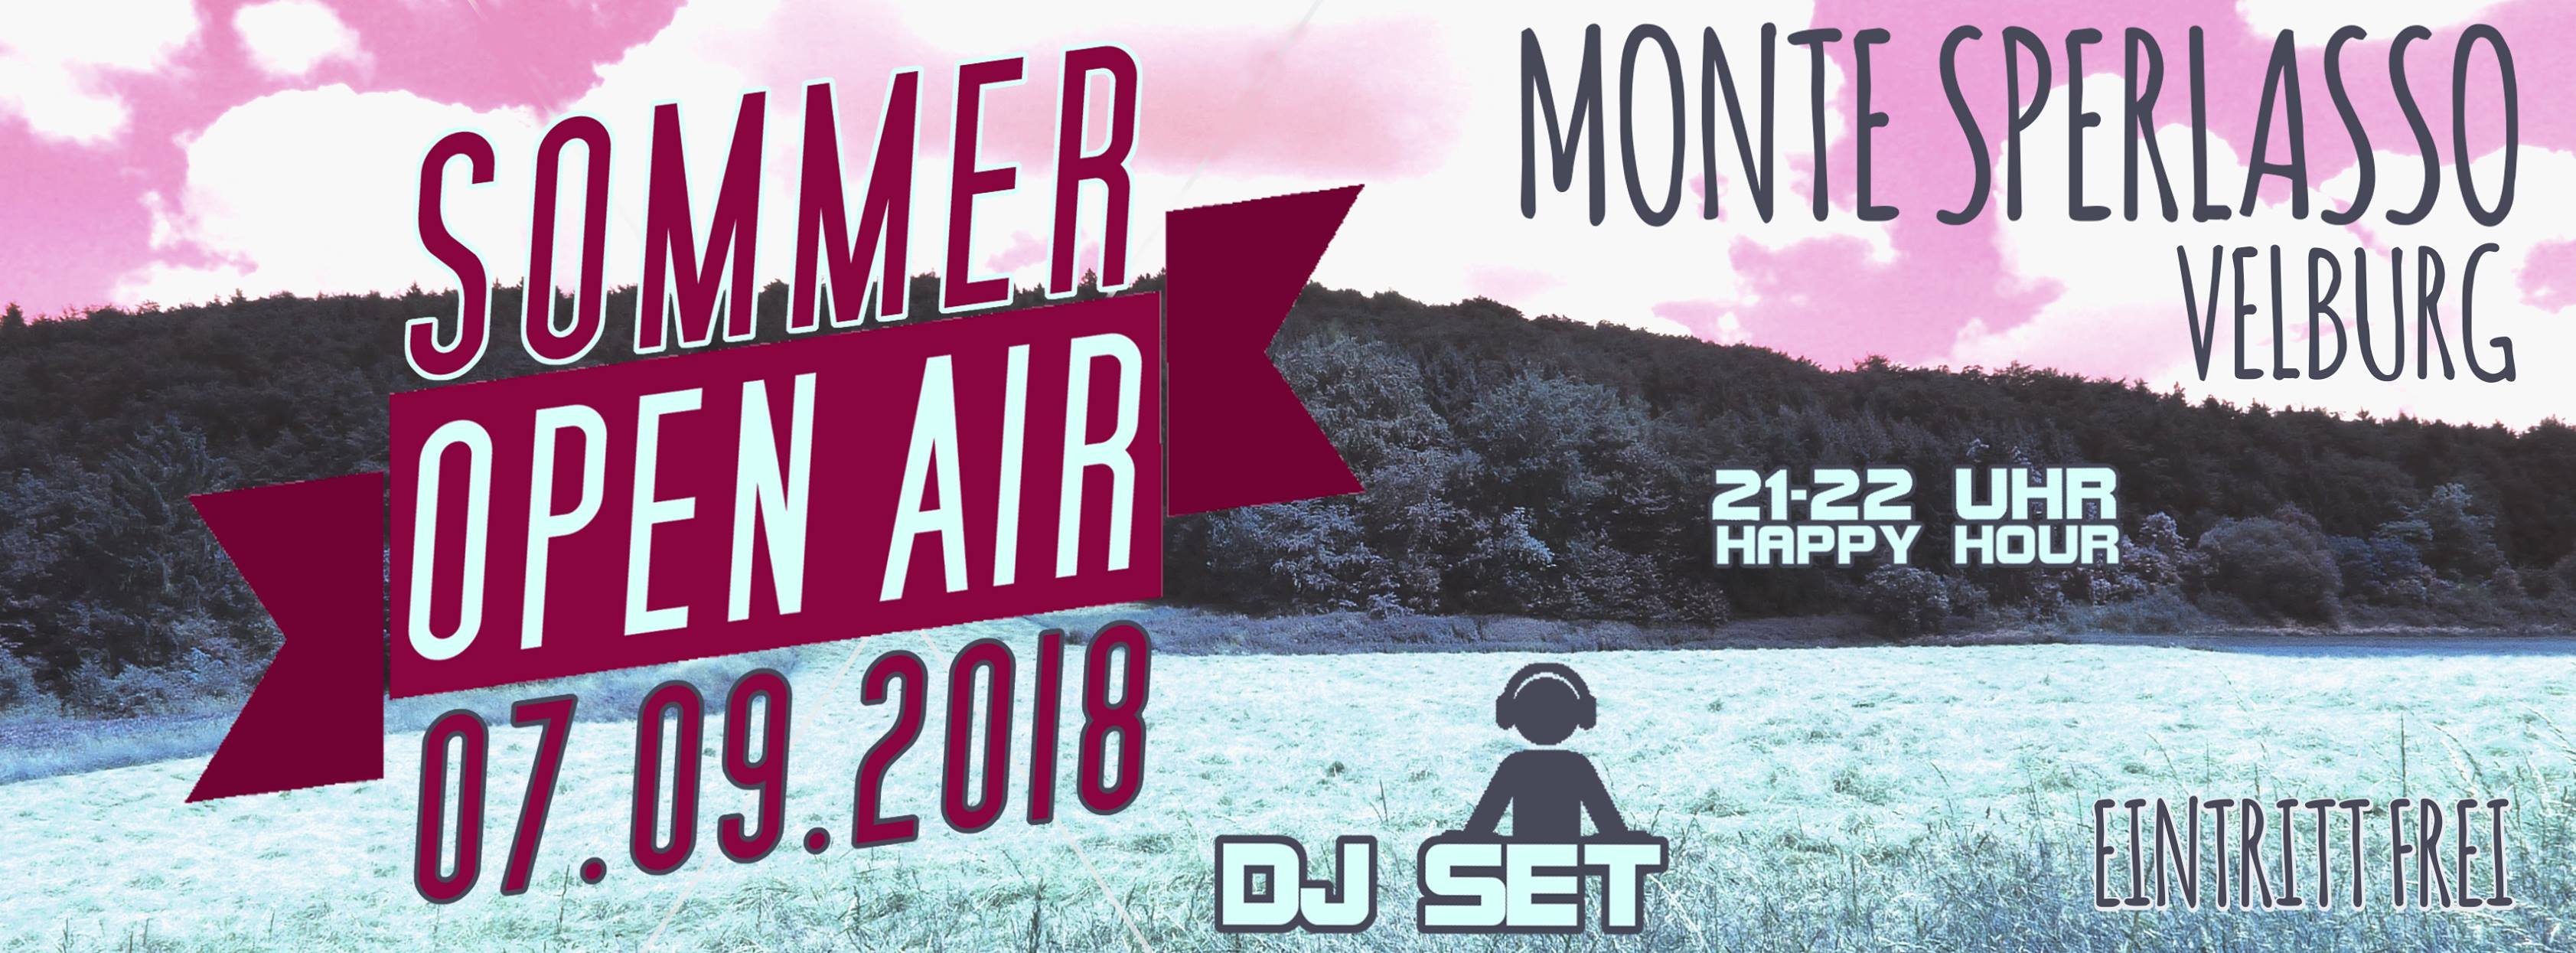 Sommer Open Air am Monte Sperlasso